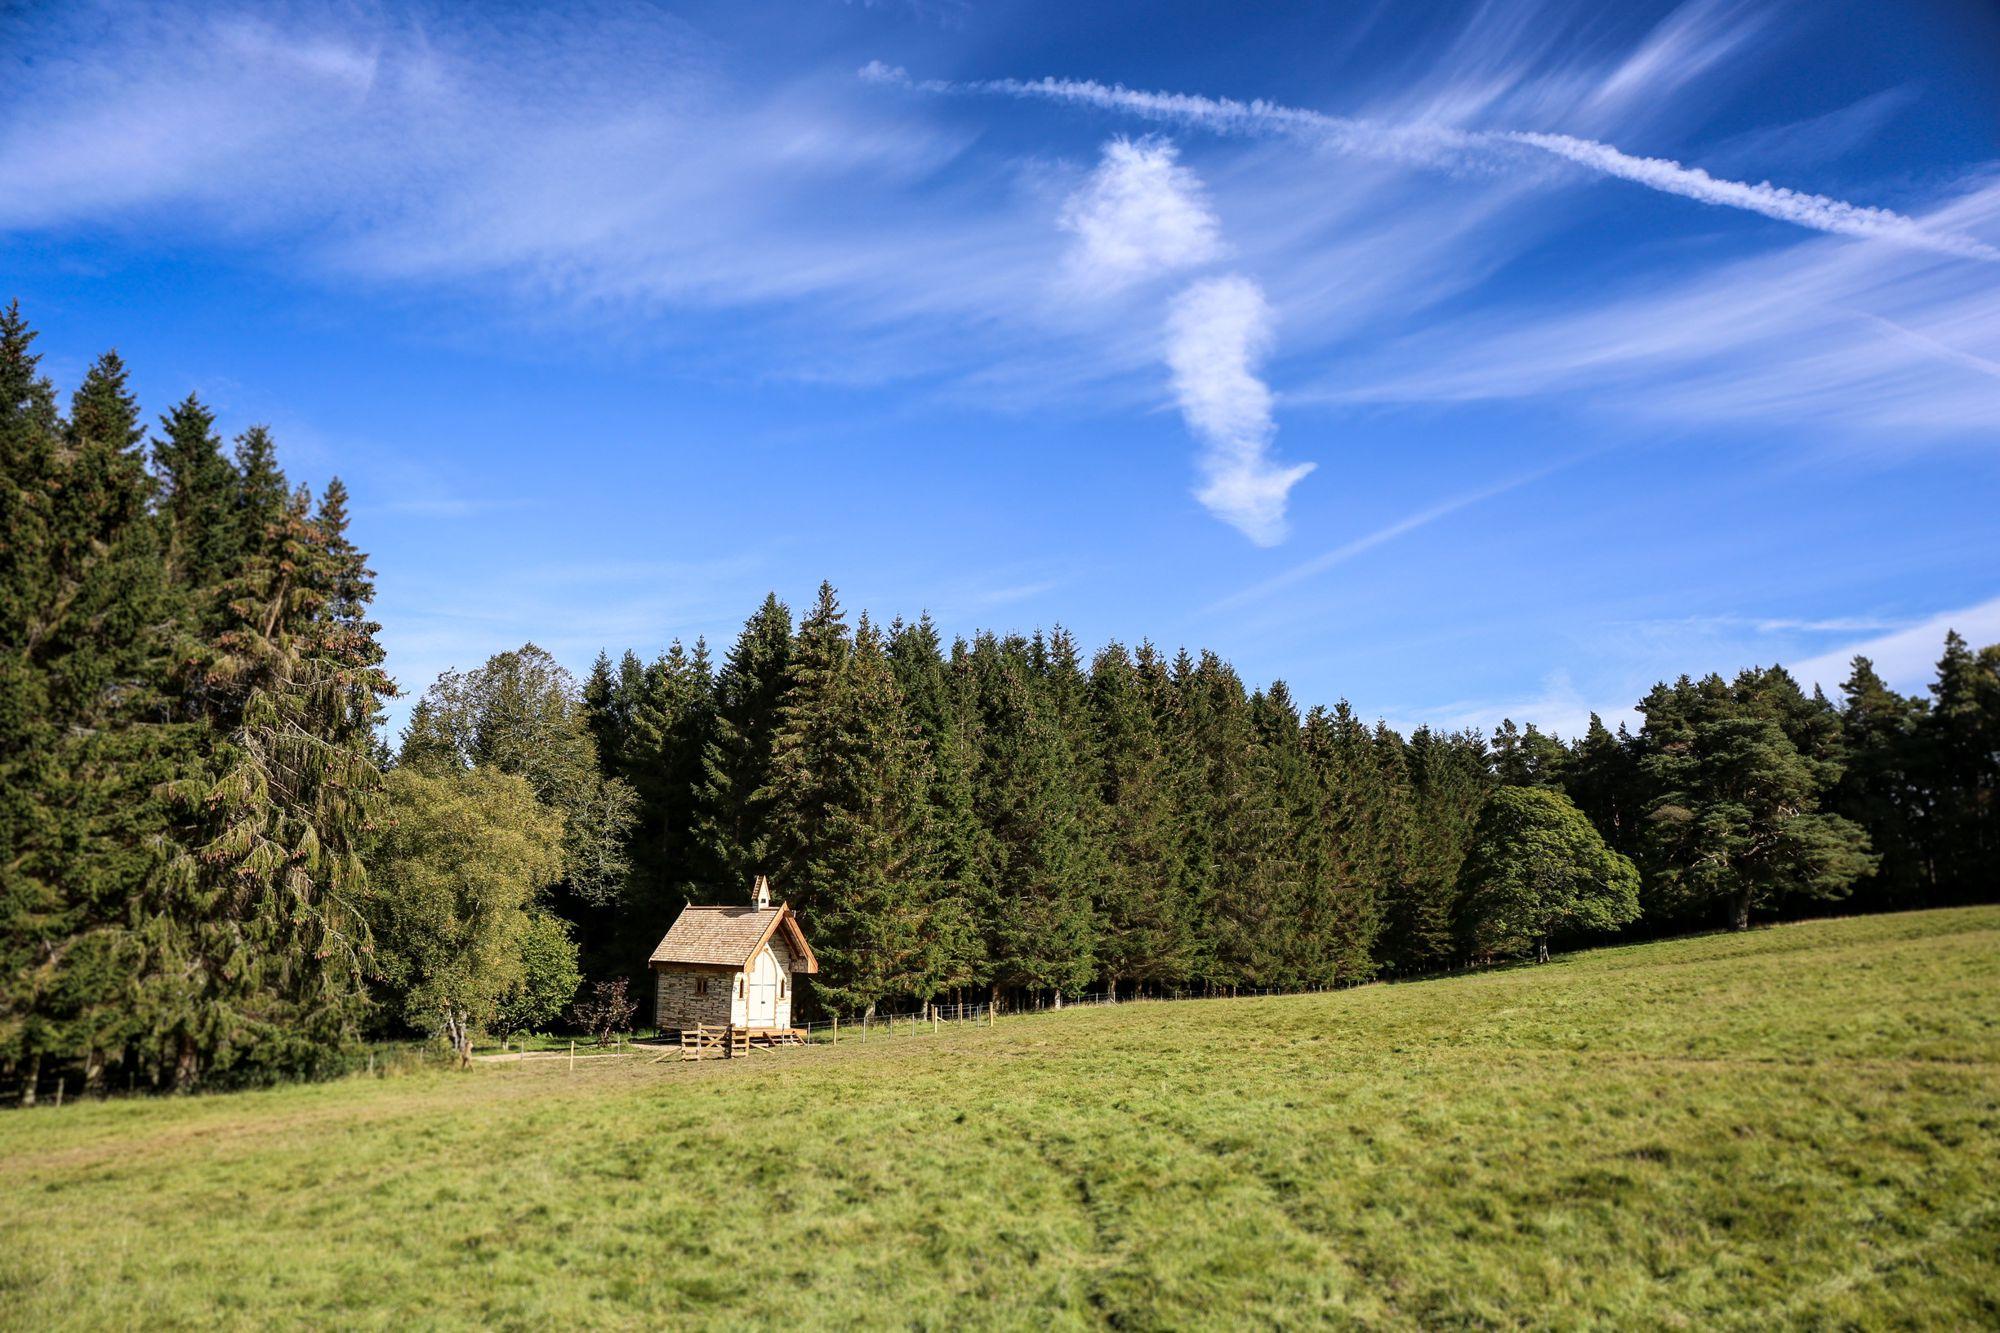 Glamping in Bellingham – Cool Camping